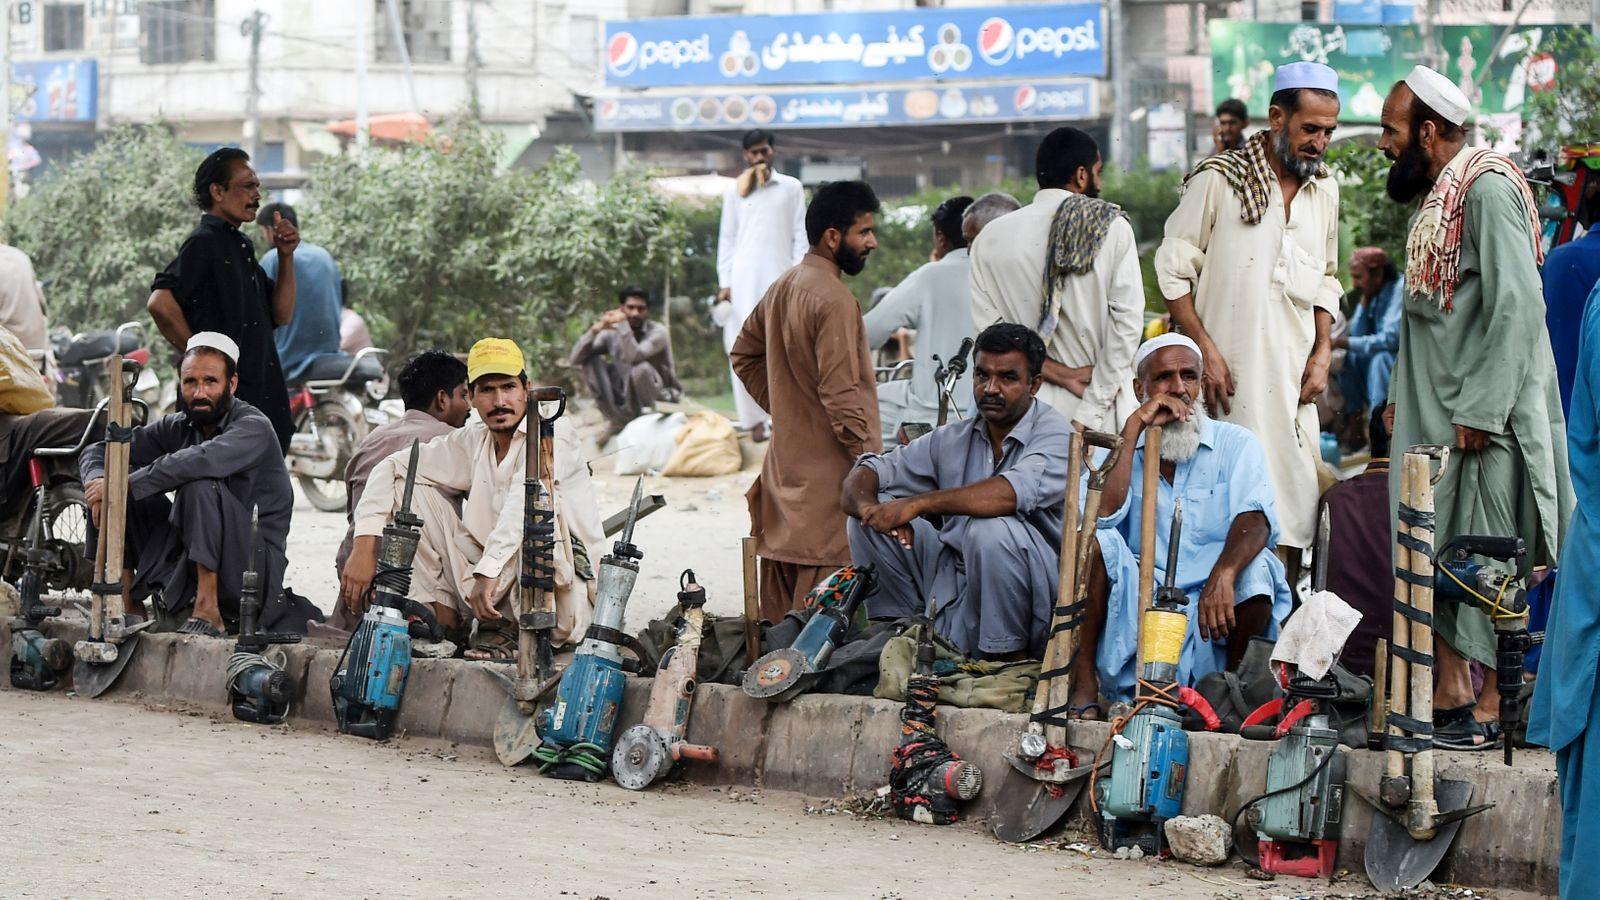 PAKISTAN-LABOUR-ECONOMY